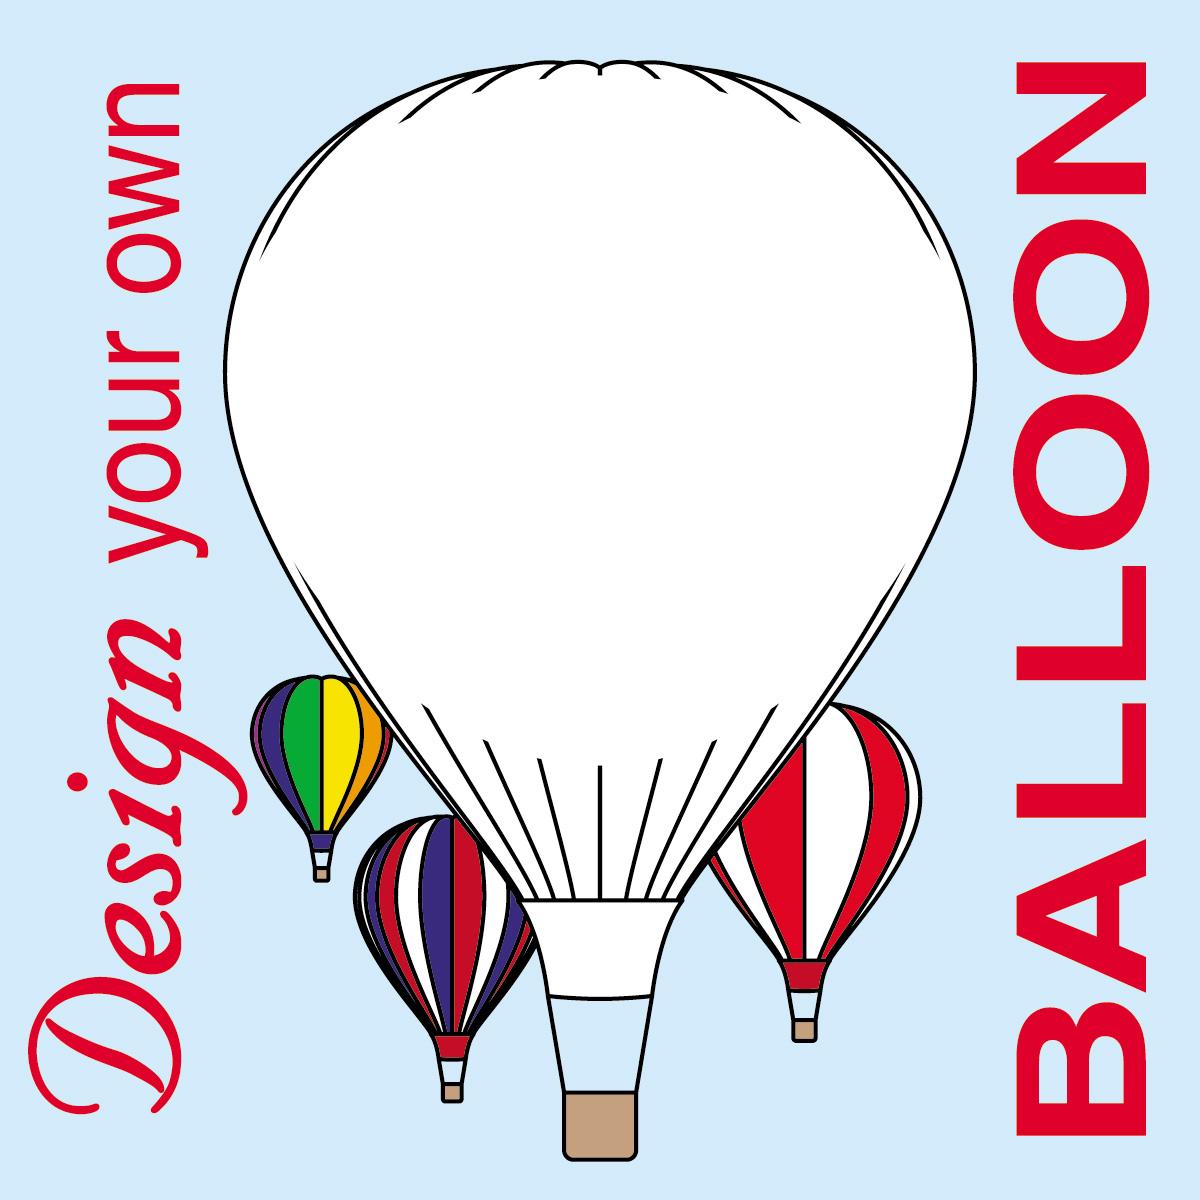 Hot Air Balloon Basket Clip Art Black And White | Clipart Panda - Free ...